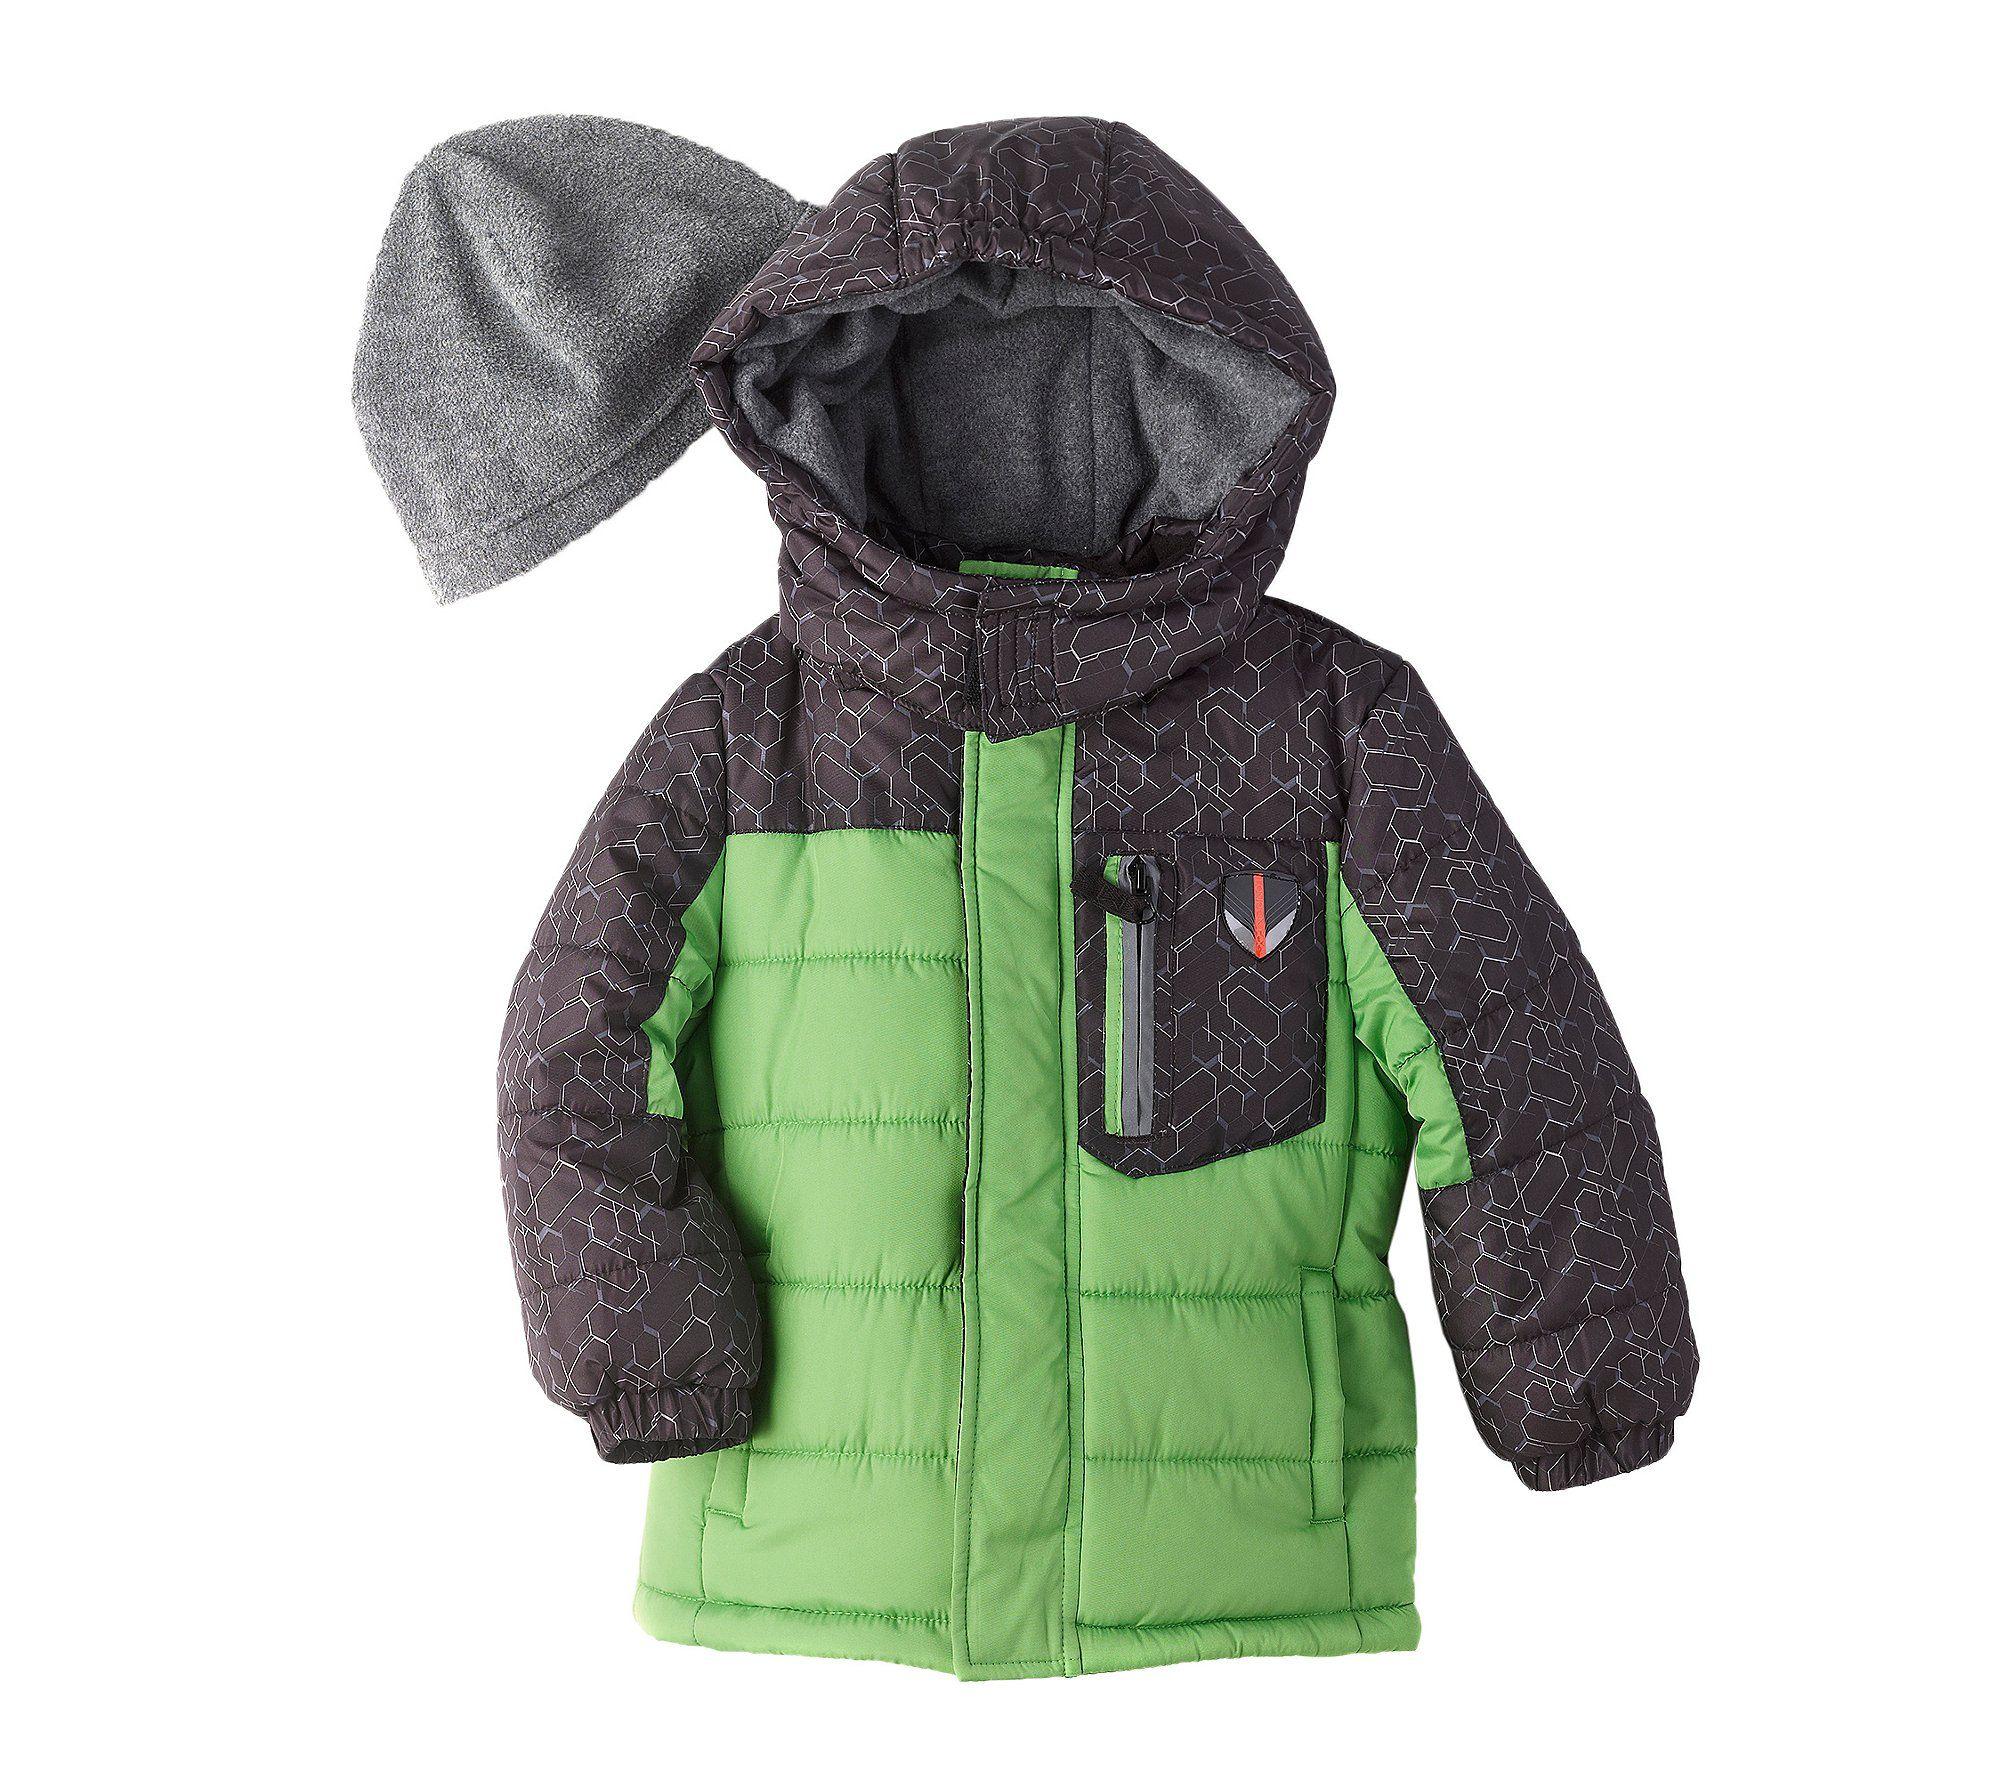 London Fog Boys Hooded Pieced Puffer Jacket